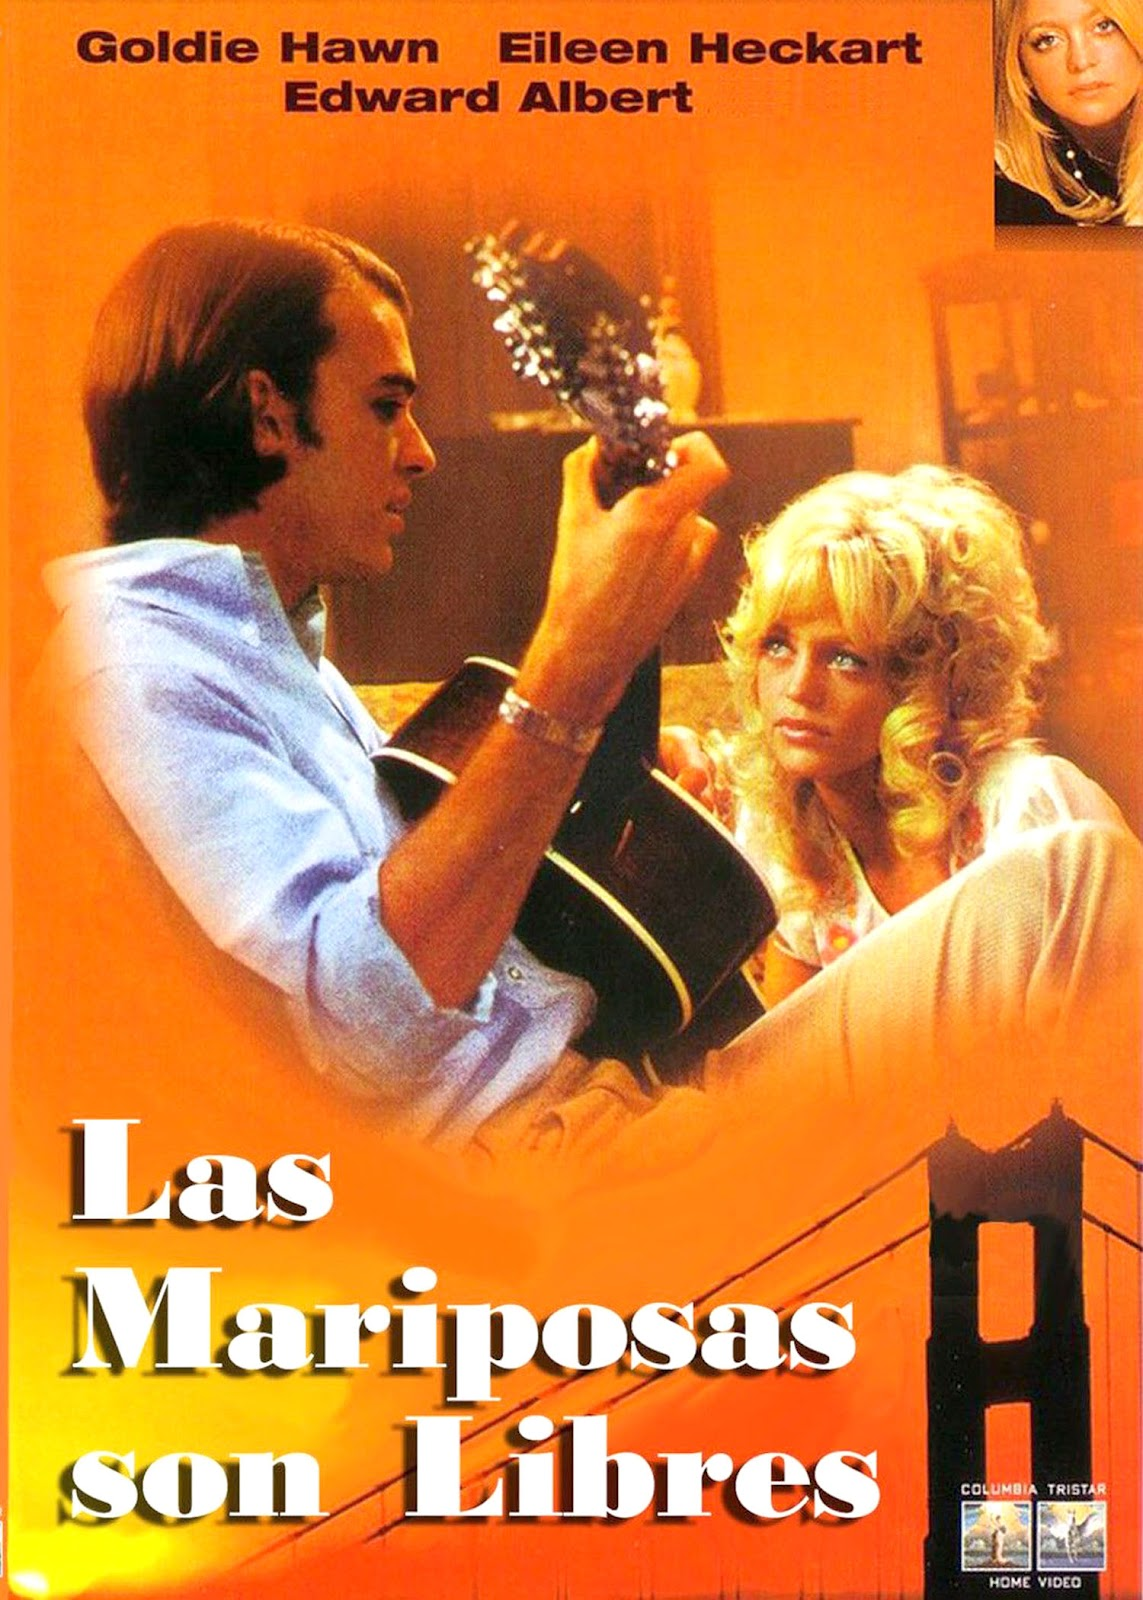 http://3.bp.blogspot.com/-vd_OsUzRtLc/T-NCEfzRHLI/AAAAAAAAIRo/YGSZdc7gLc0/s1600/Las+Mariposas+Son+Libres.jpg